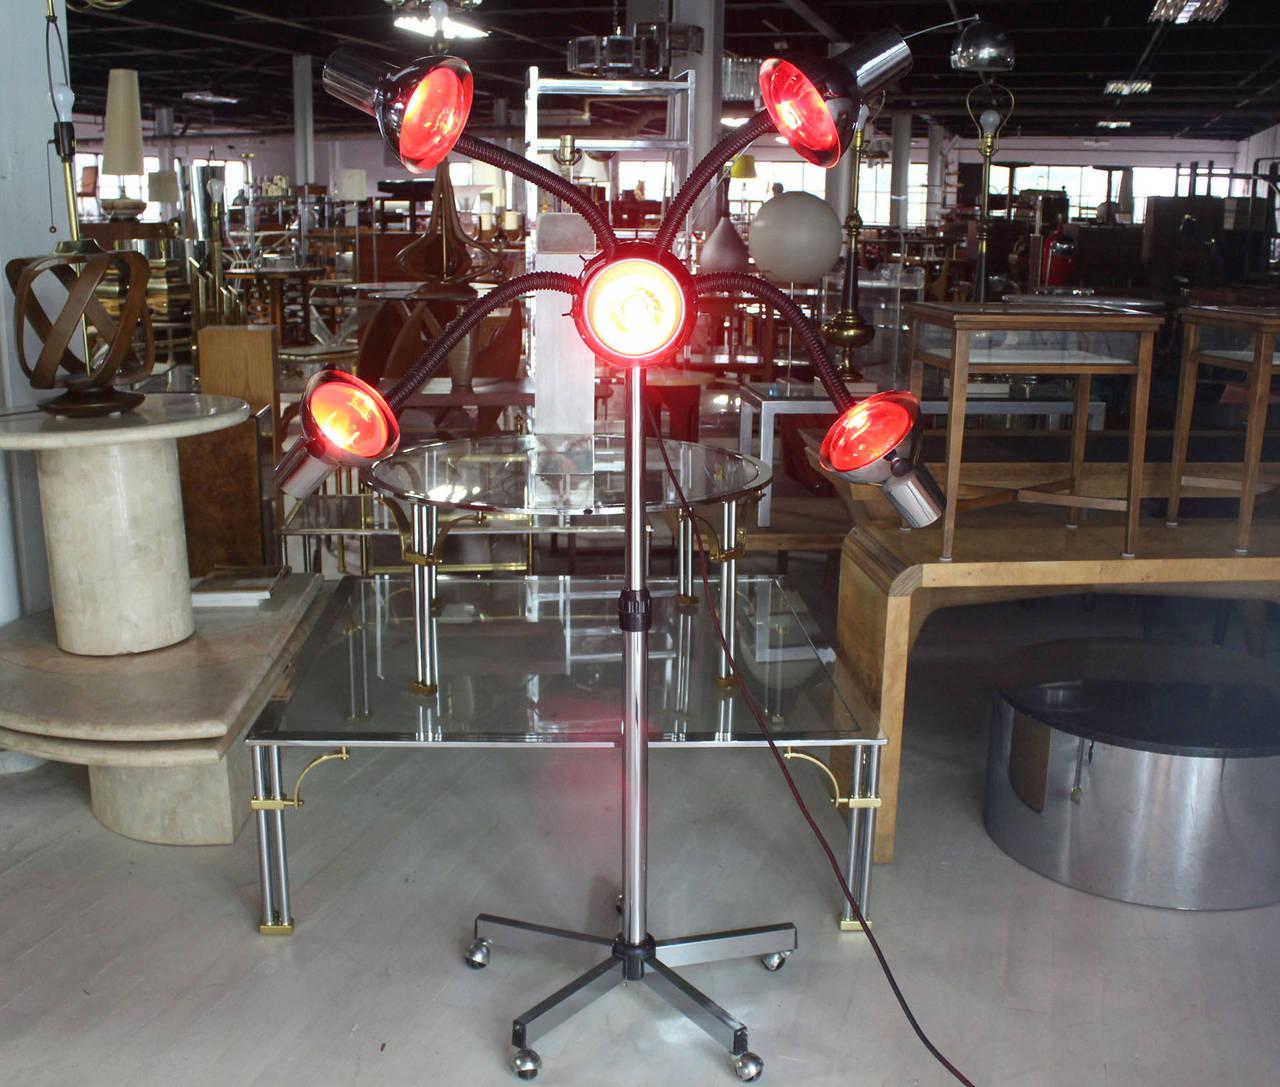 century modern adjustable four arm lamp heat lamps for sale at 1stdibs. Black Bedroom Furniture Sets. Home Design Ideas